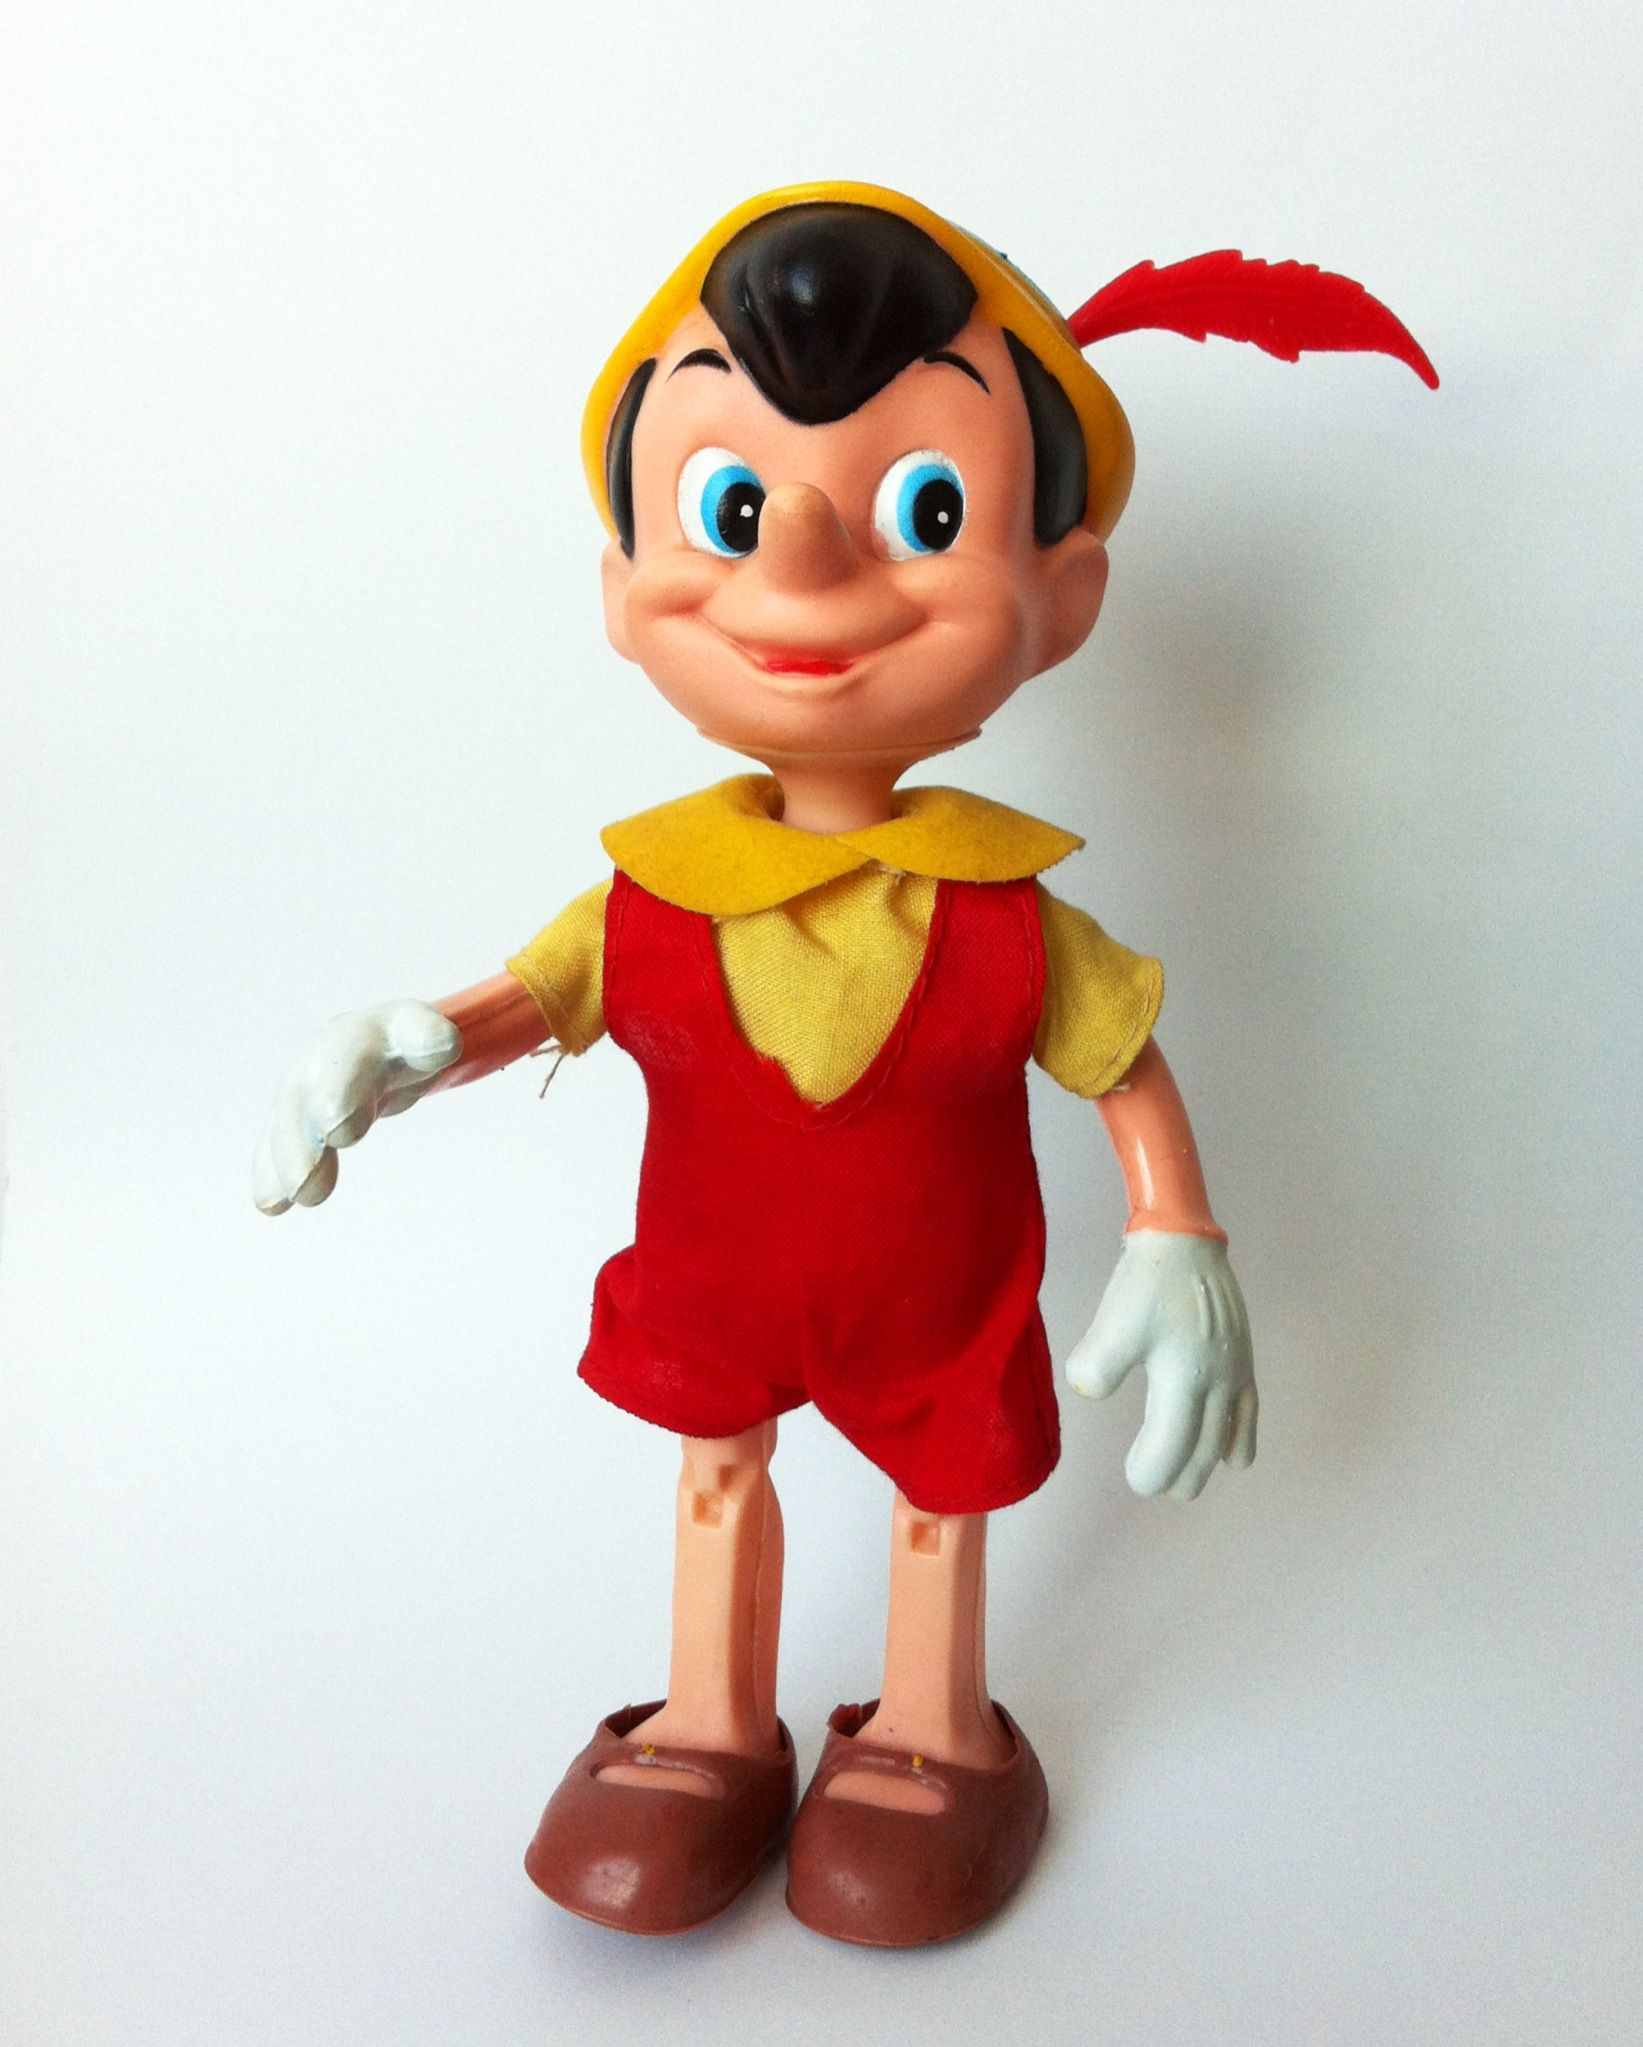 Vintage Pinocchio Toy 1960 Vintage Rubber Toys